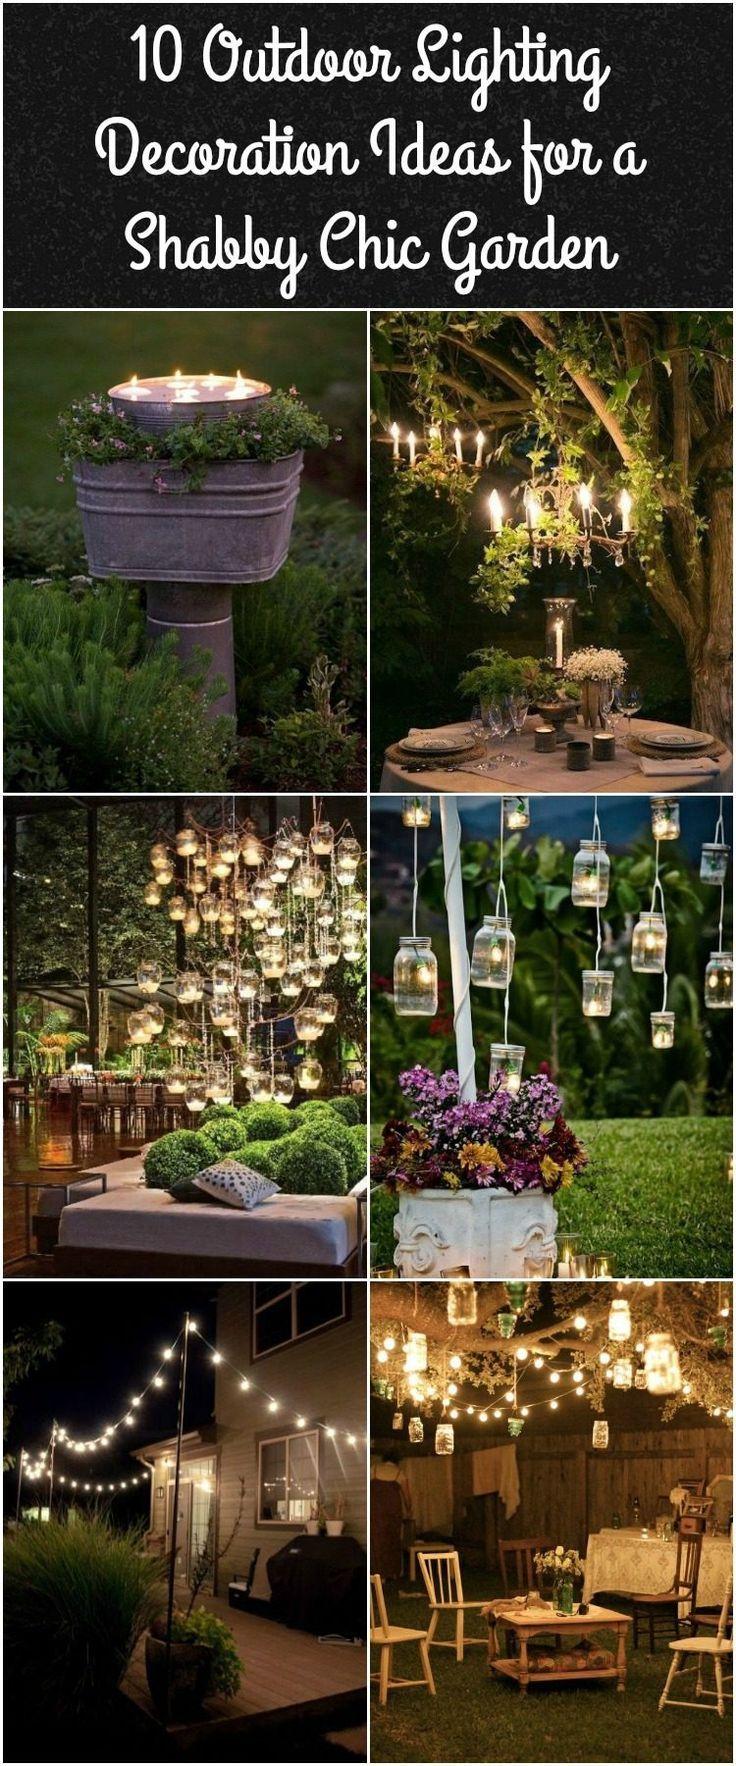 Shabby Chic Für Den Garten 10 outdoor lighting ideas for a shabby chic garden 6 is lovely